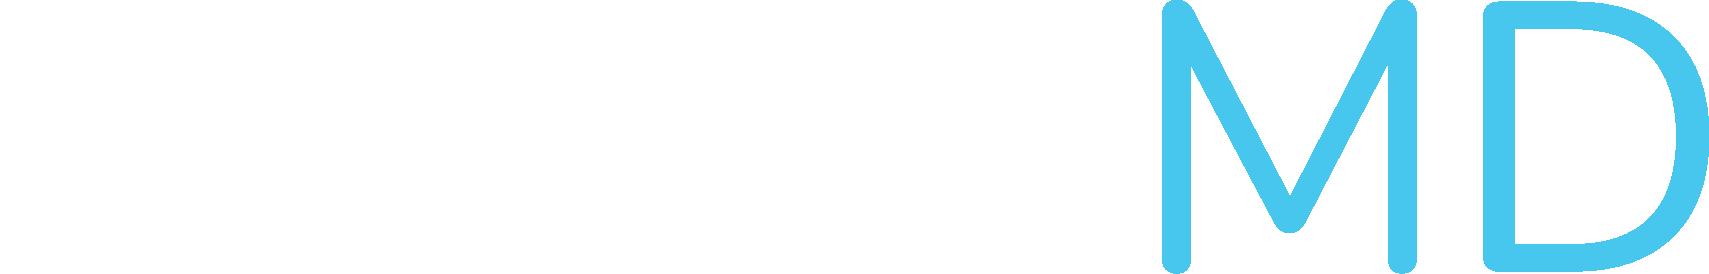 ithrivemd_logo_white